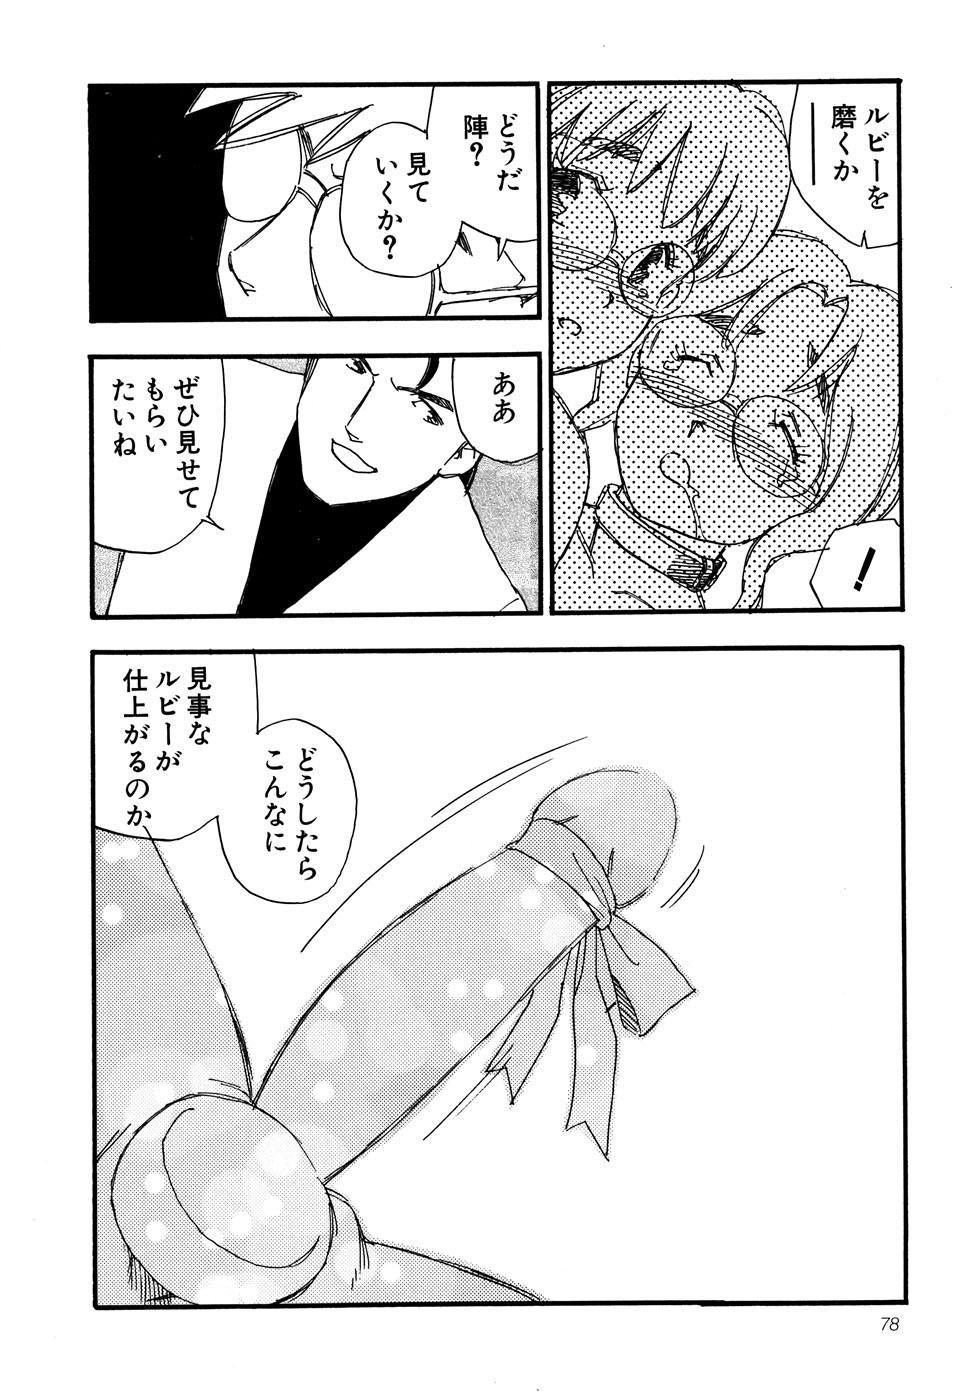 G-drive Vol.1 Ryoujokuhen 77